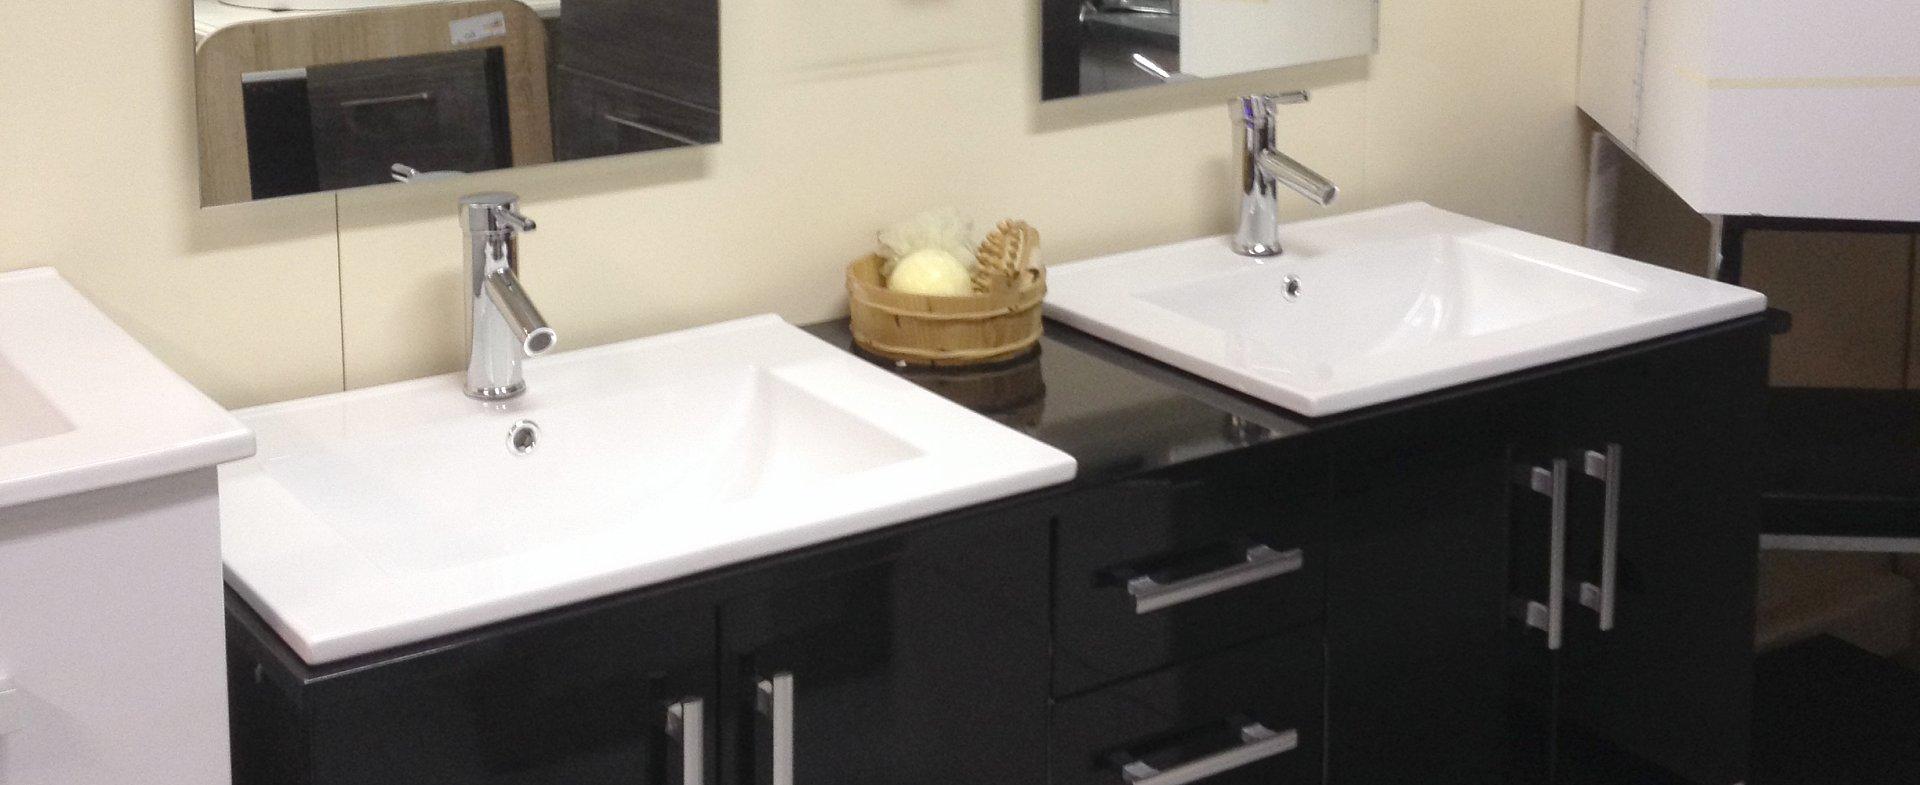 Mario destock vente de meubles et lectrom nager prix for Destock cuisine